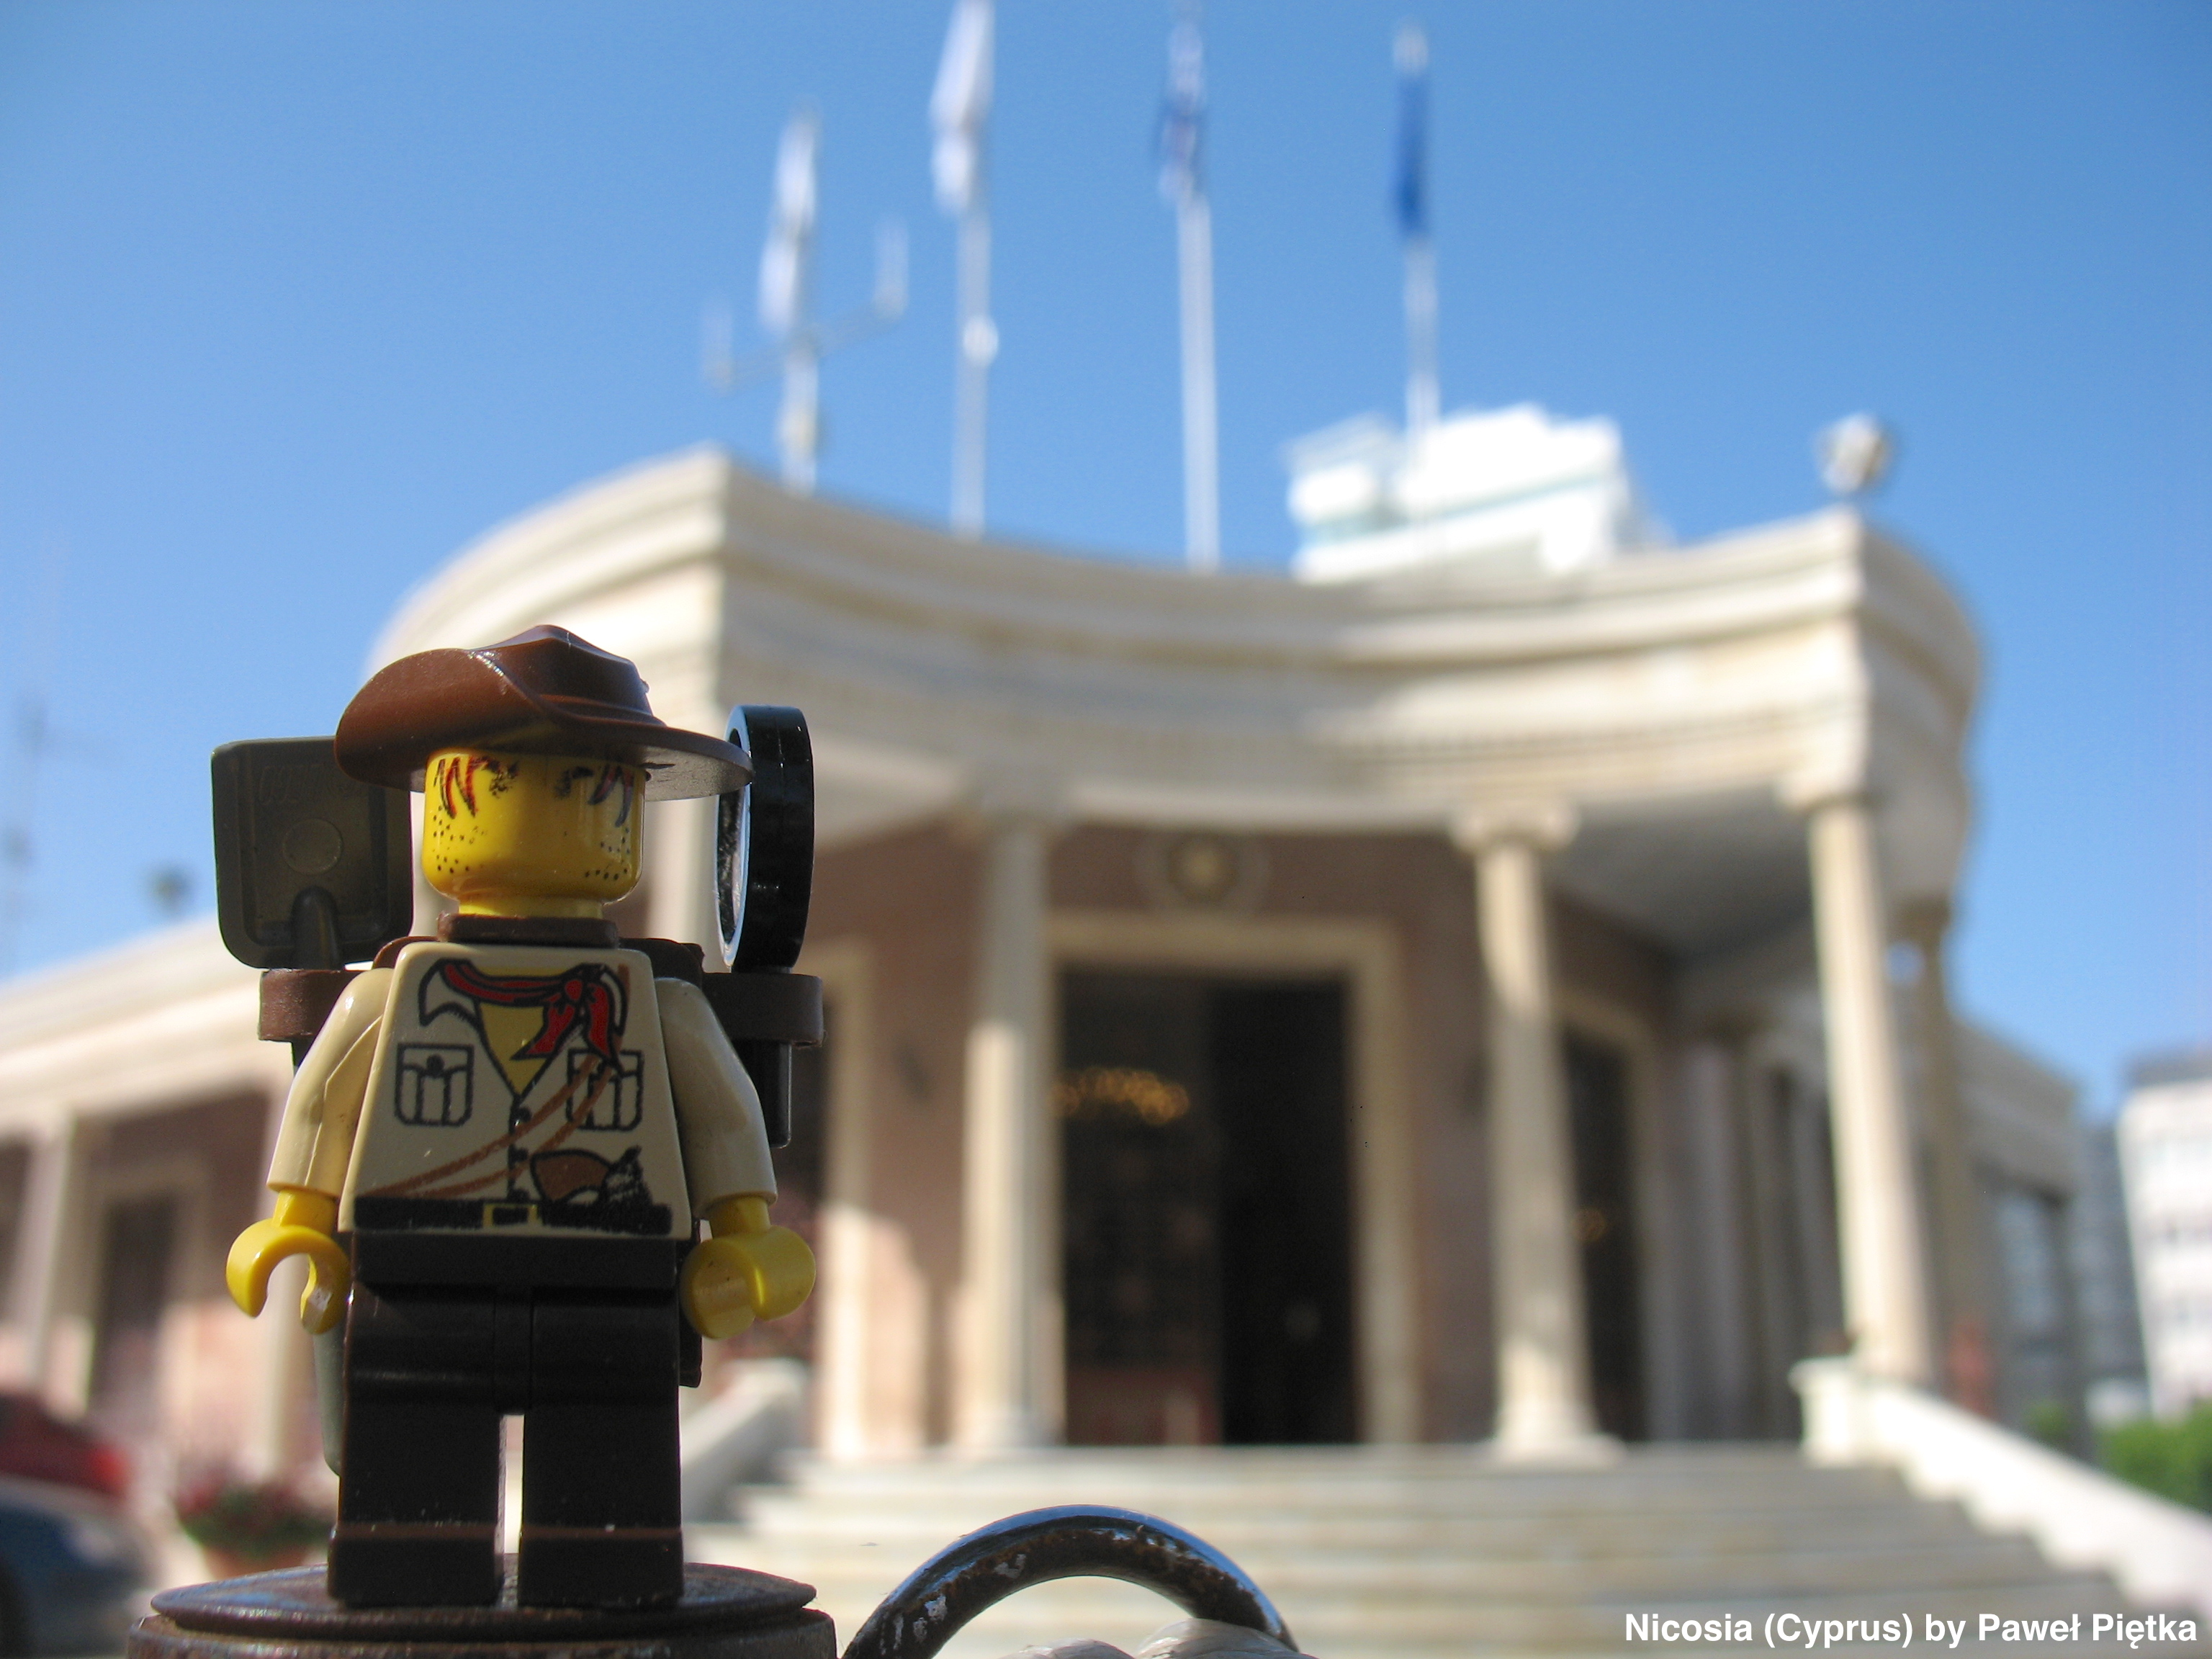 Nicosia (Cyprus) - Municipality building Eleftheria Square